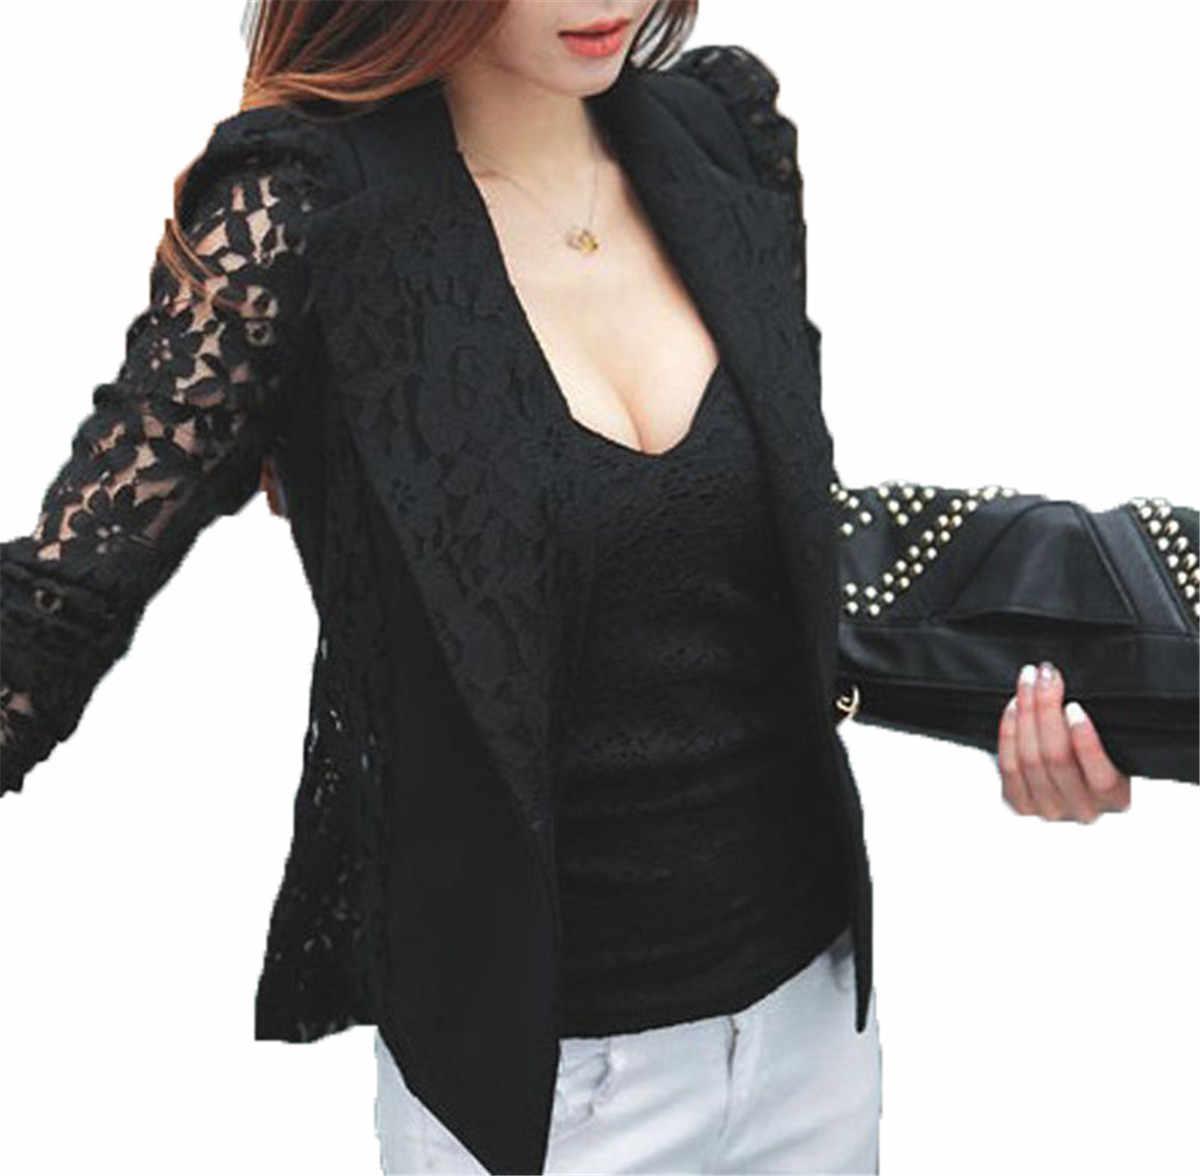 e0e0c1da0ac5 ... Women Lace Crochet Blazers Jackets 2018 New Summer Autumn Fashion Slim  One Button Blazer Femenino Ladies ...